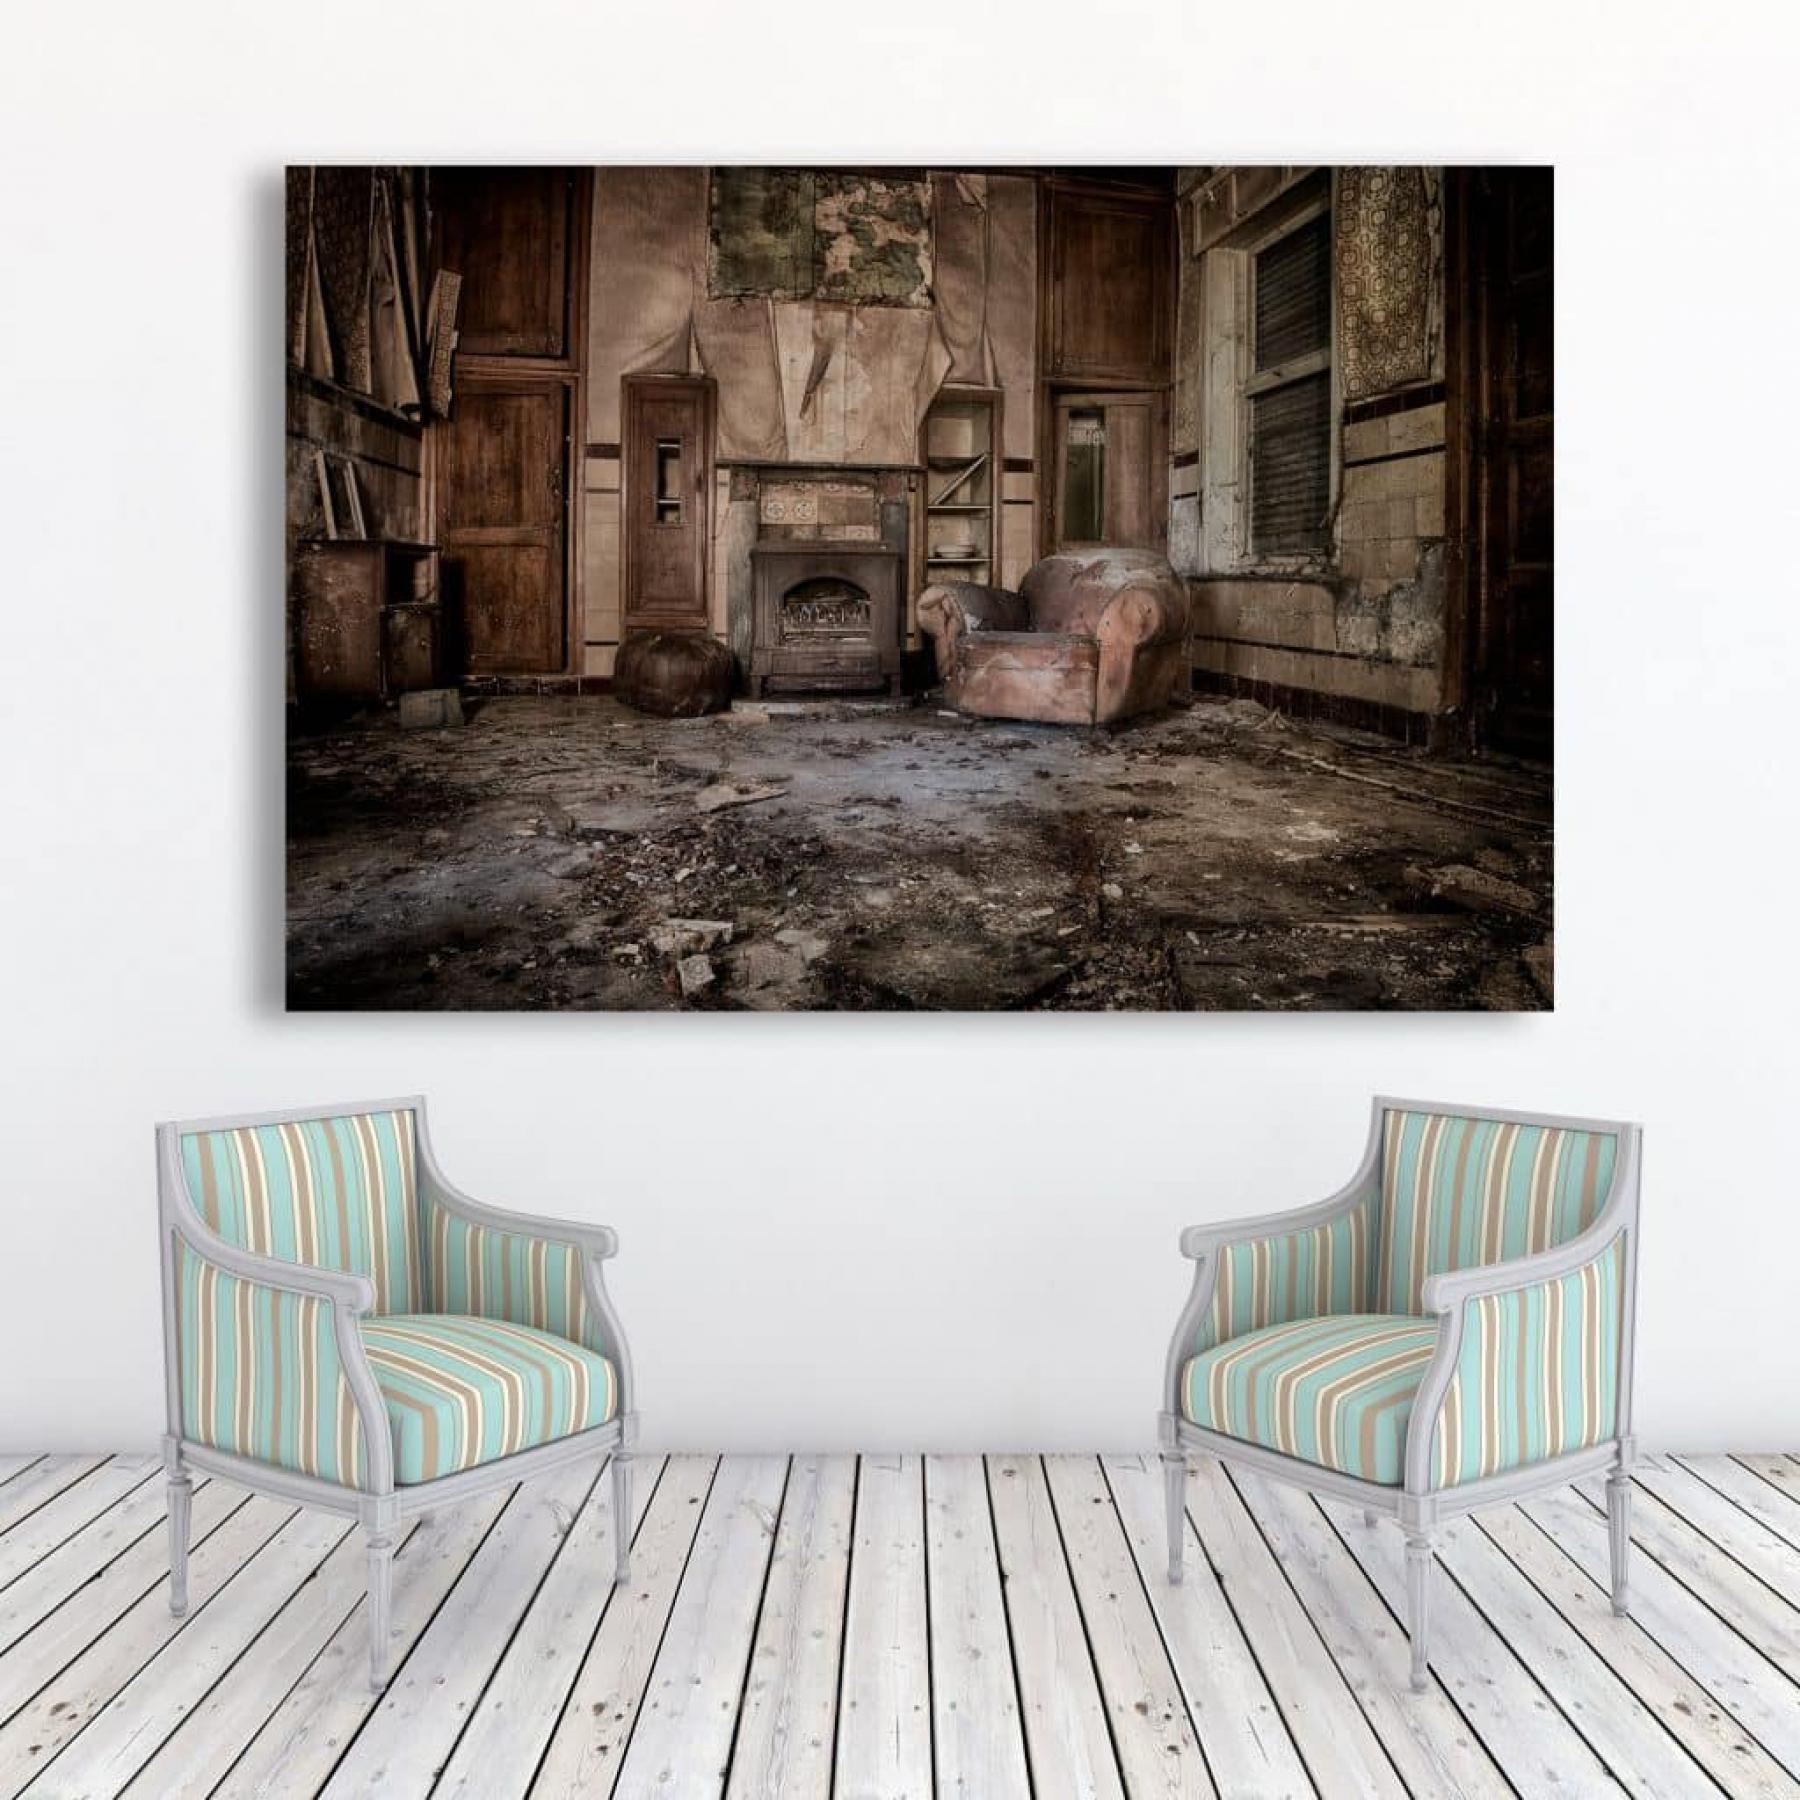 THE LIVING ROOM BELGIUM